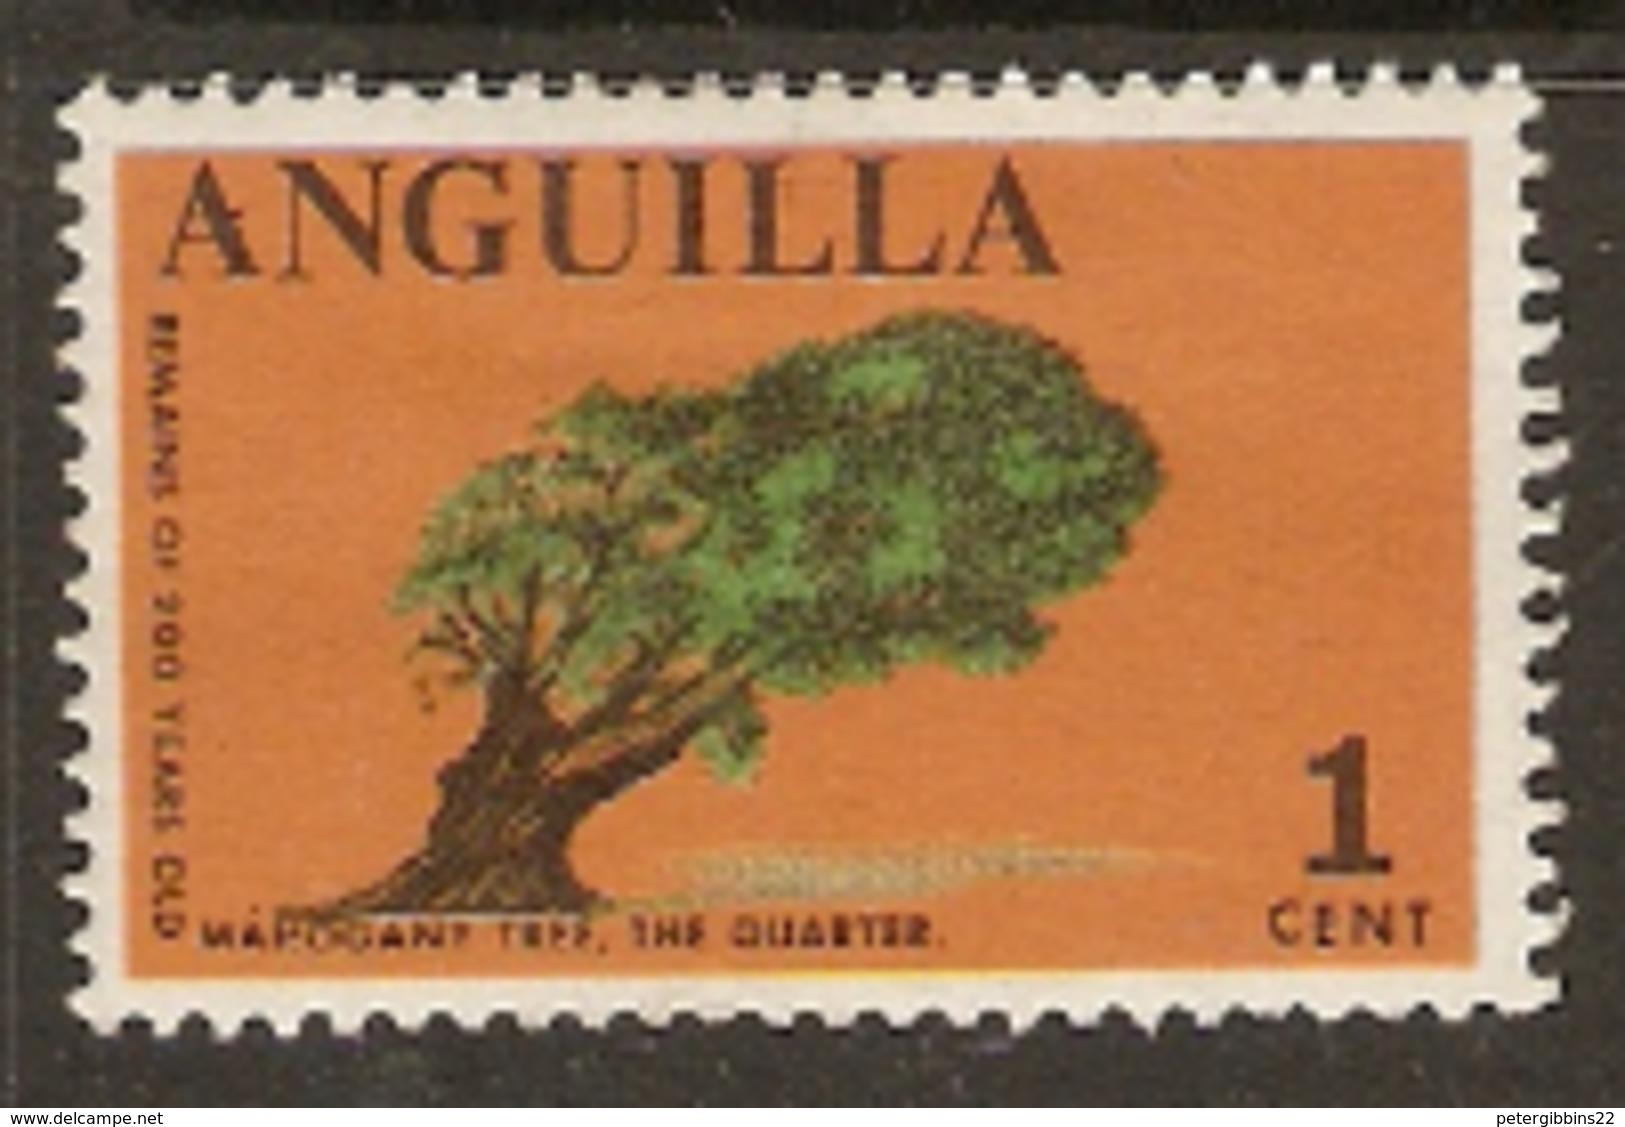 Anguilla  1967 SG  17  Mahoganay Tree  The Quarter  Mounted Mint - Anguilla (1968-...)